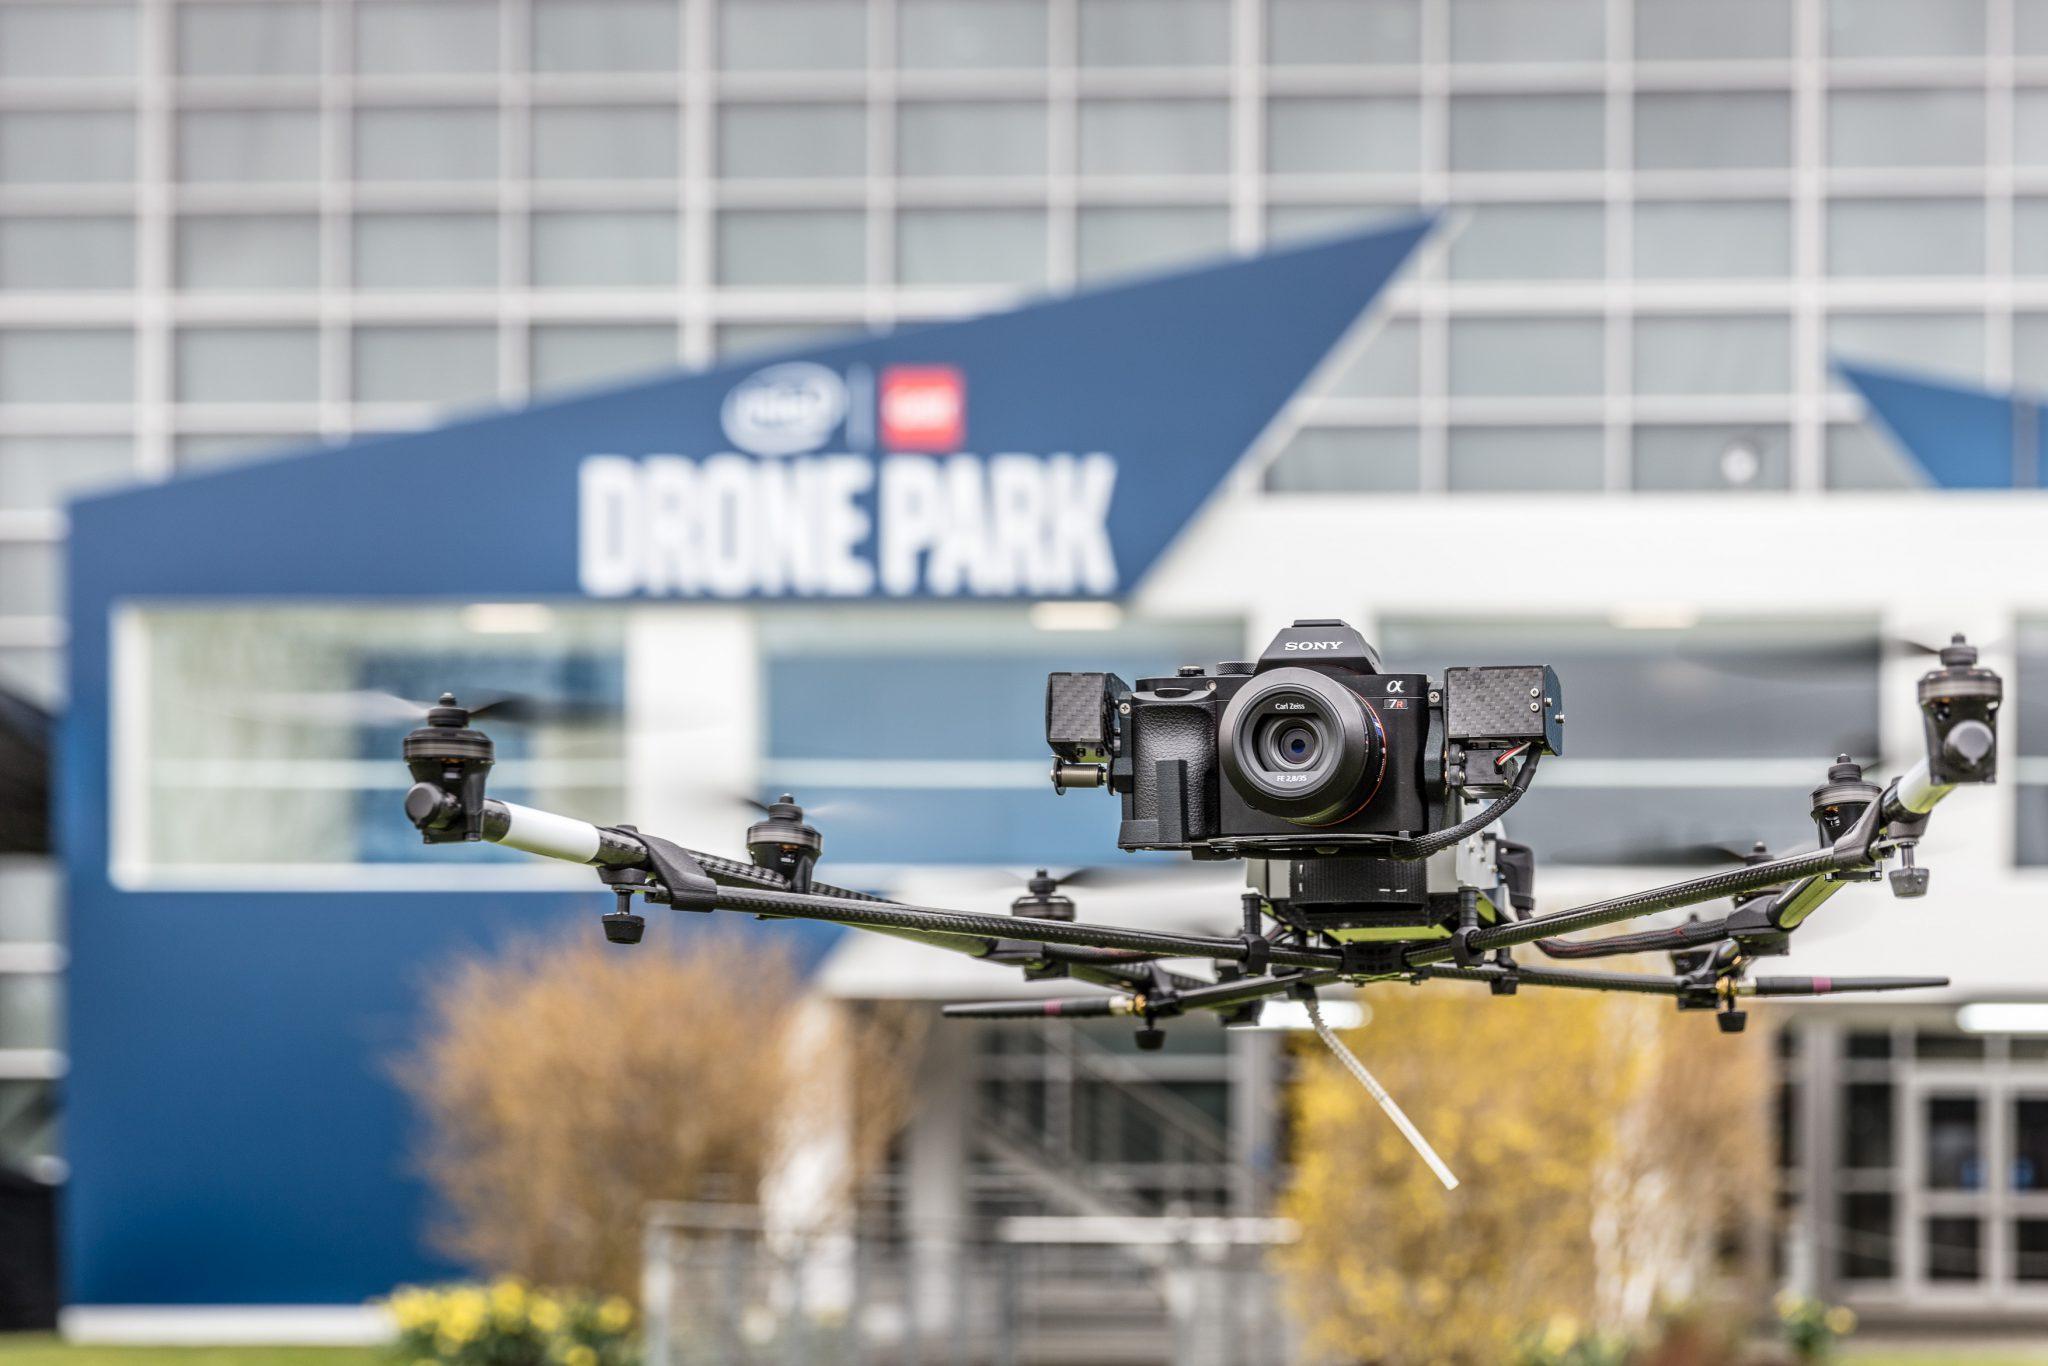 Intel CeBIT Drohnen Park